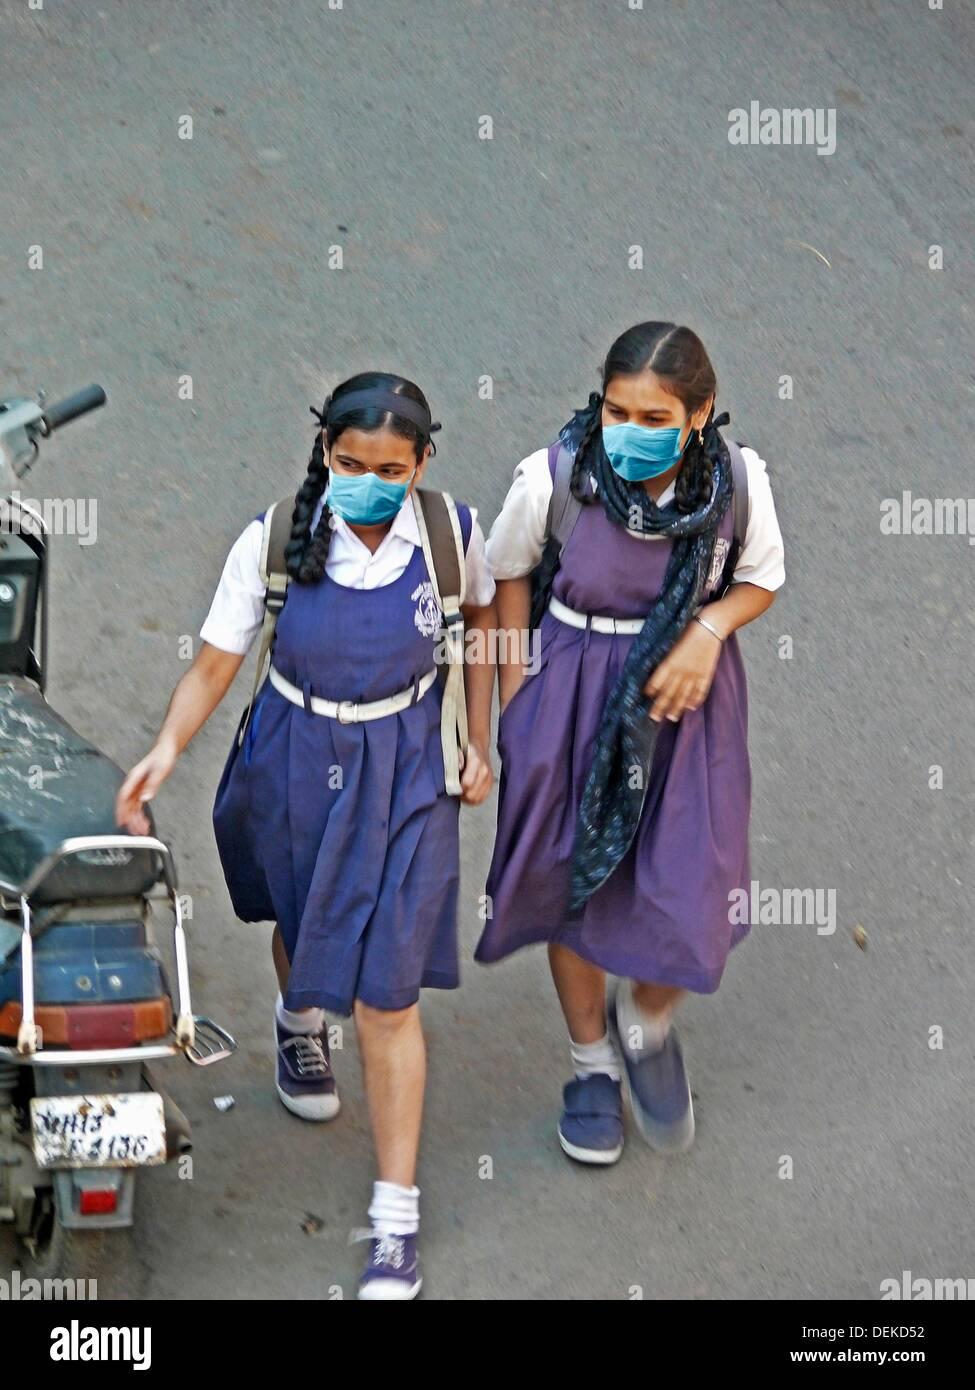 Schoolgirls, Precaution Mask for Swine Flu, H1N1 Stock Photo